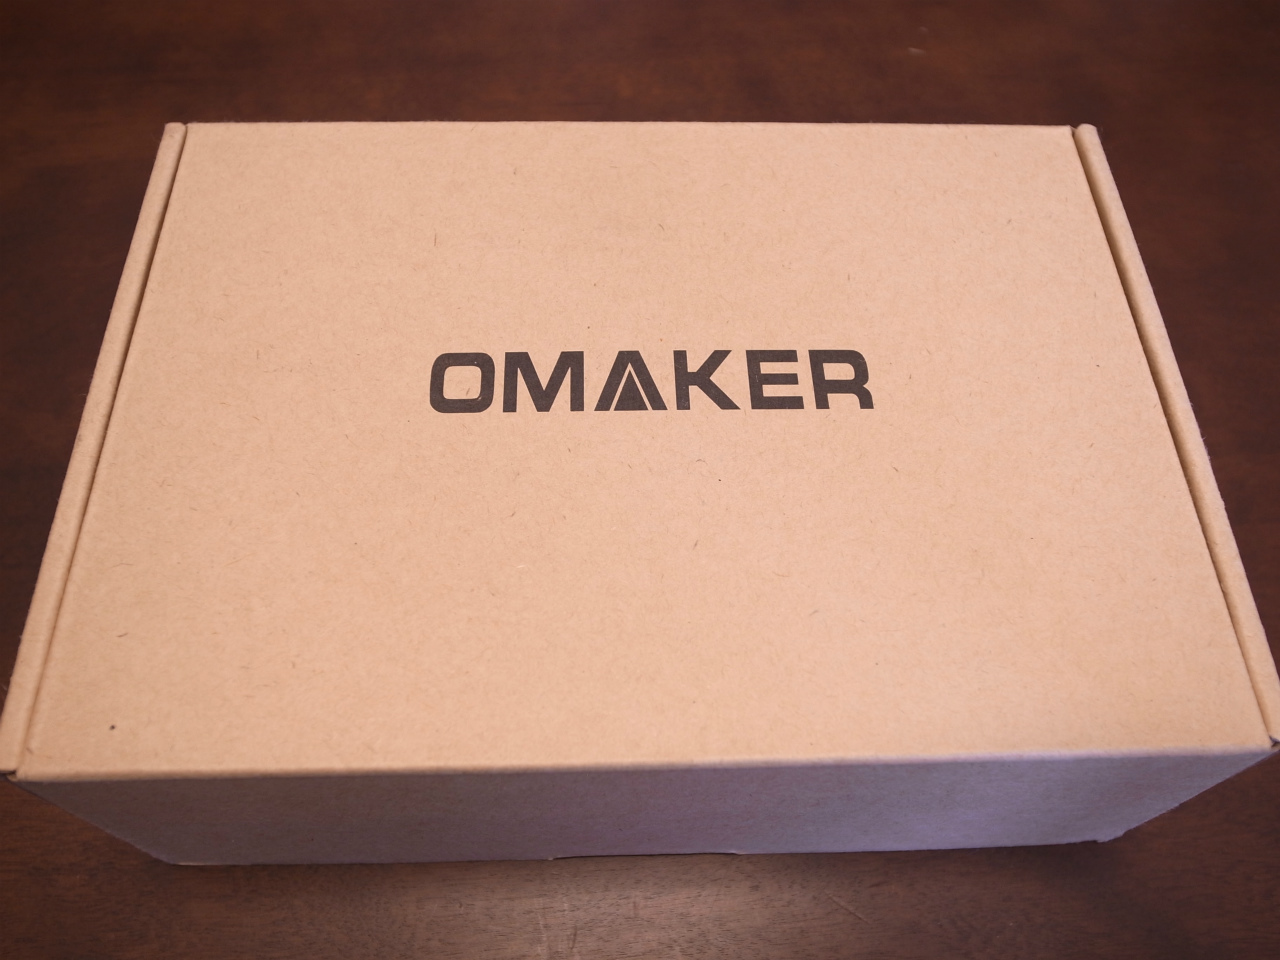 pr-omaker-m4-01